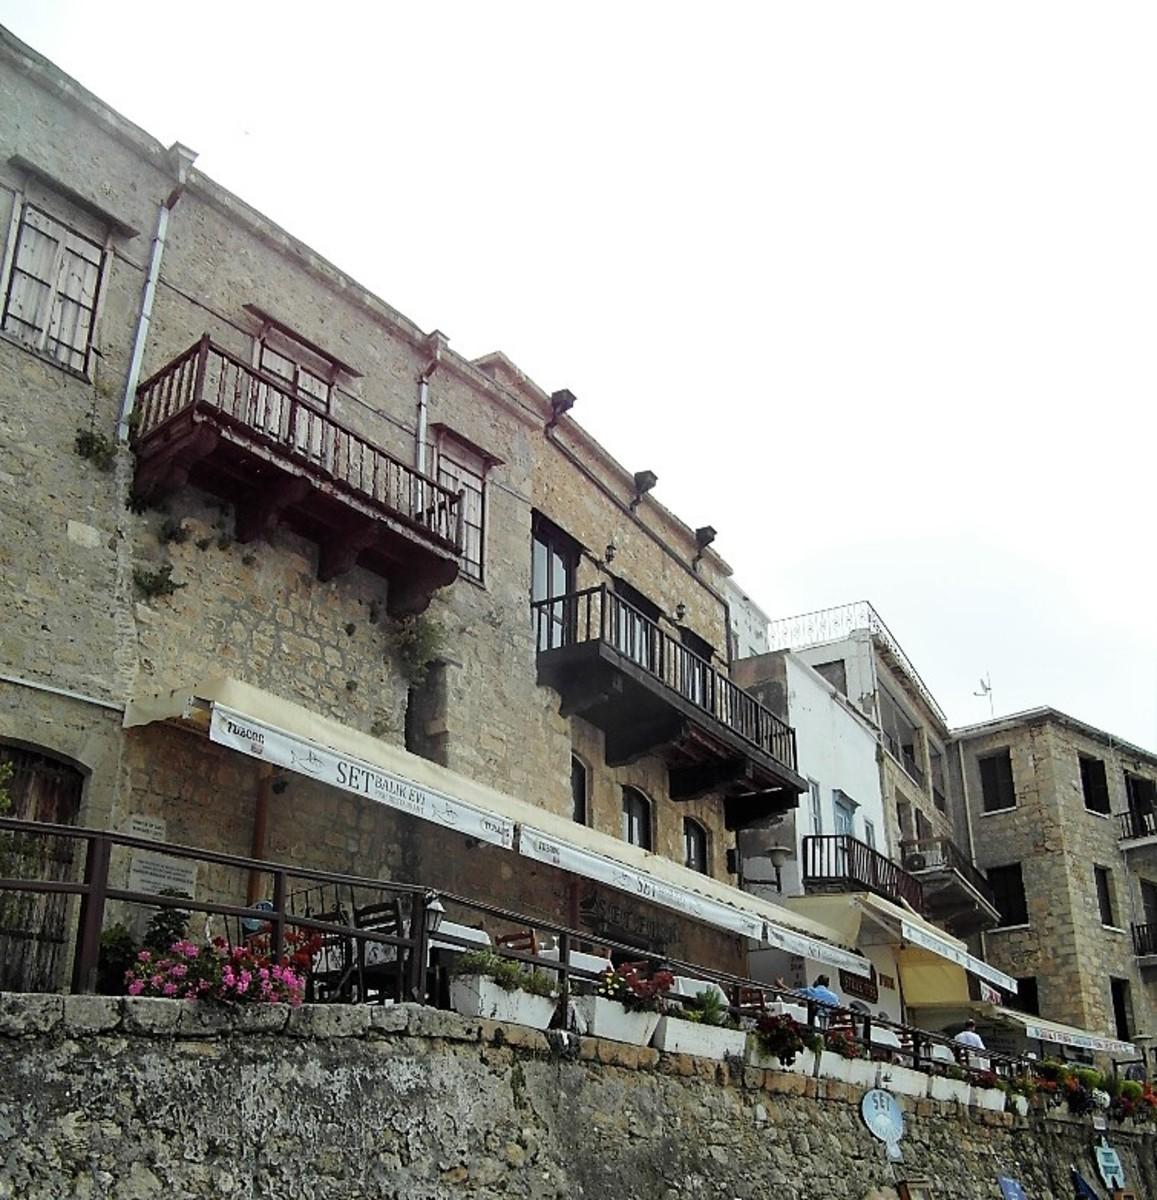 Set Balik Evi restaurant, Kyrenia.